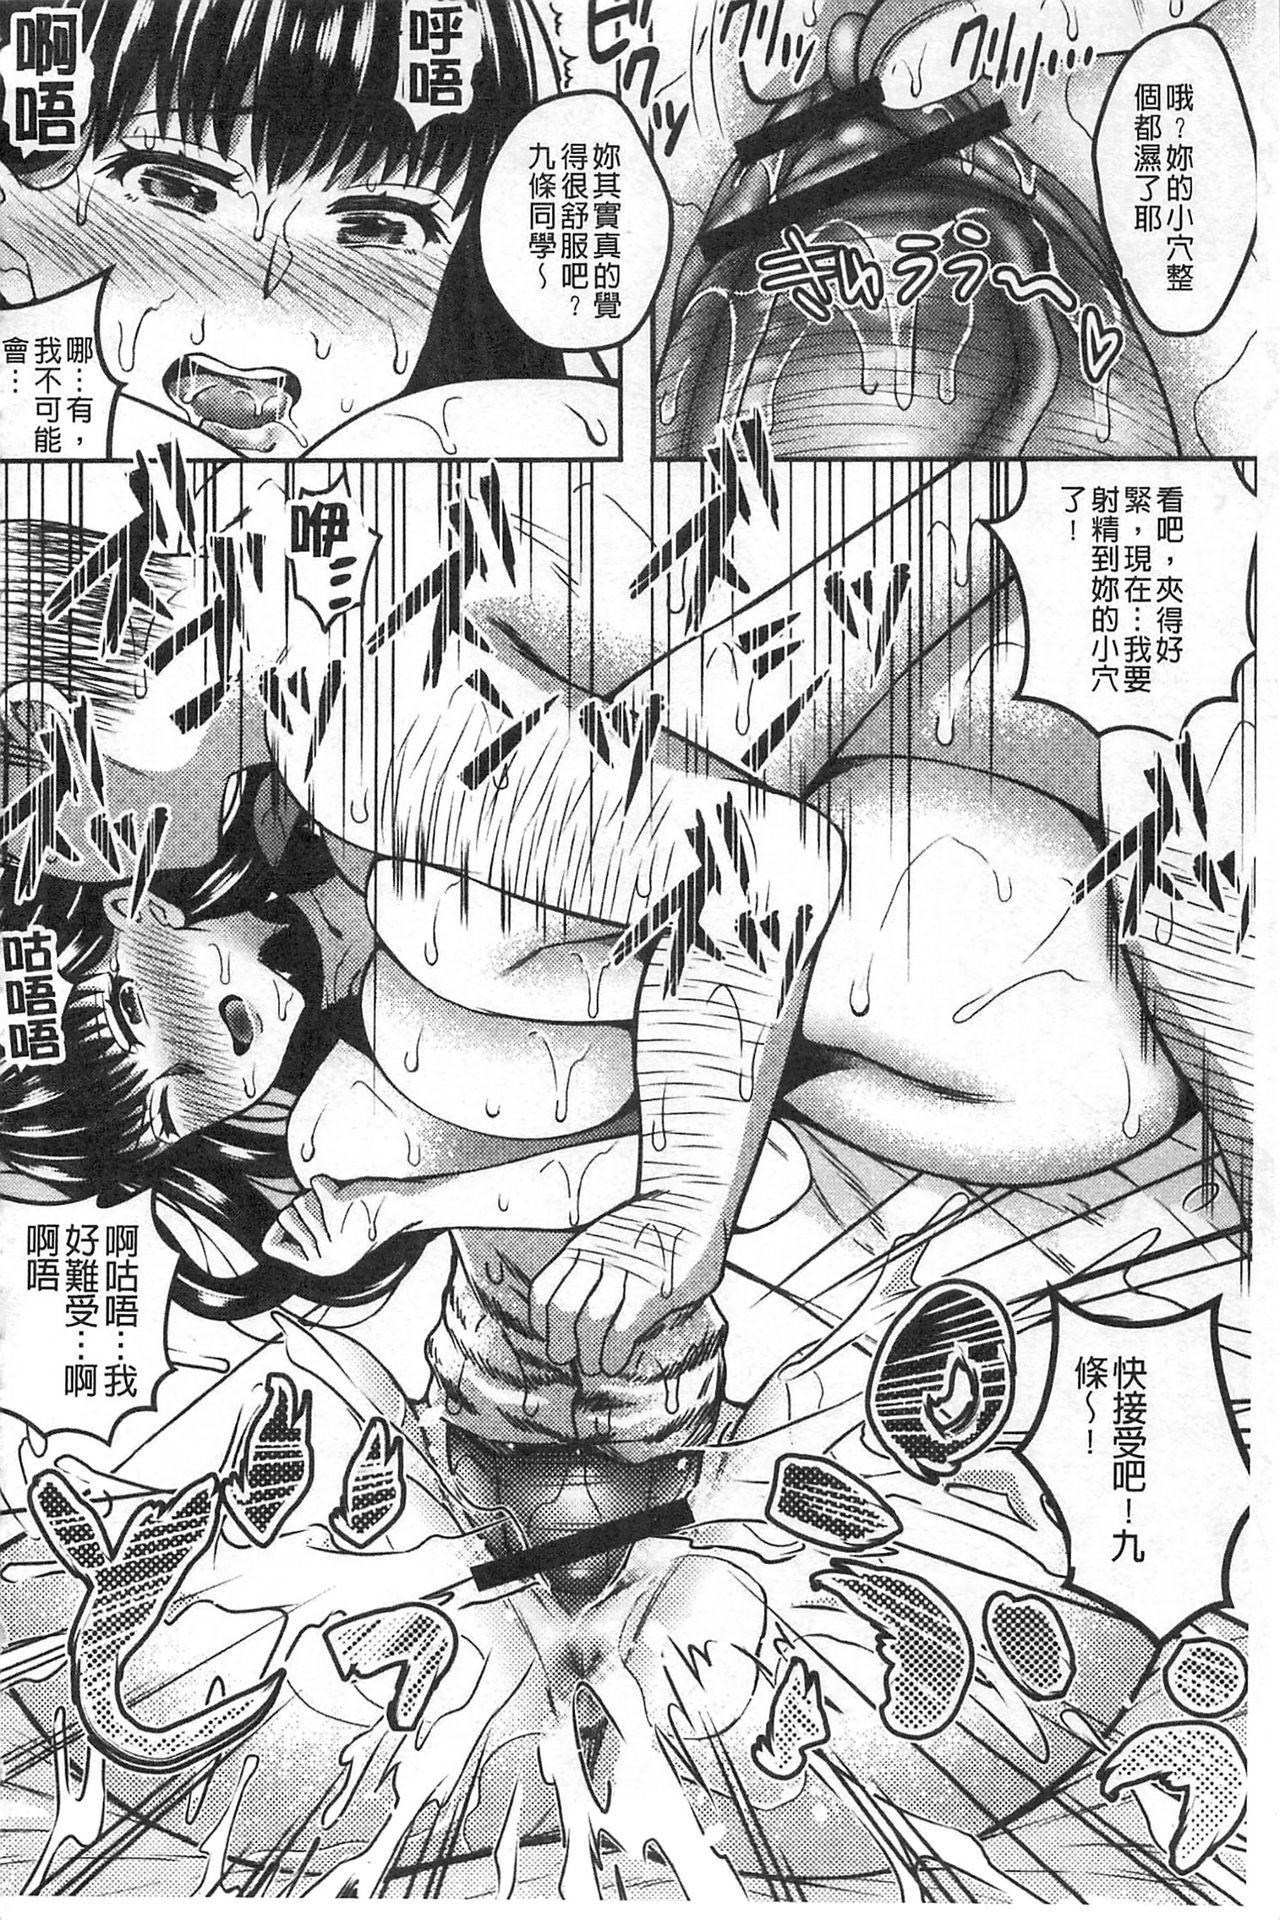 Kanjuku Otome no Odoshikata | 姦熟乙女的脅迫法 61